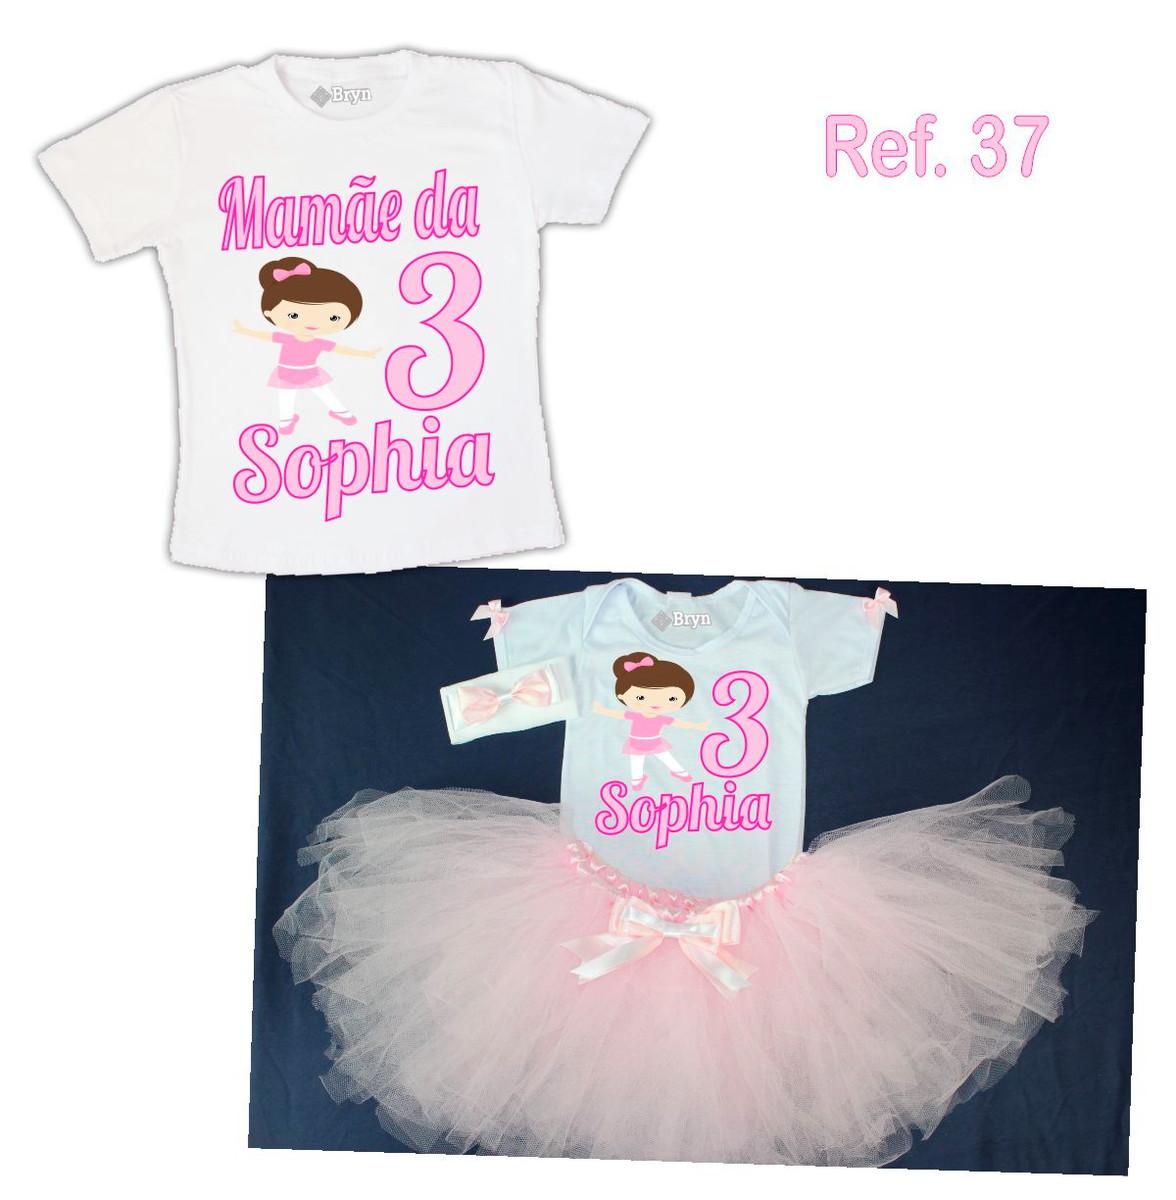 3961f077bd Kit Fantasia Tutu Bailarina Rosa Claro + 1 Camiseta no Elo7